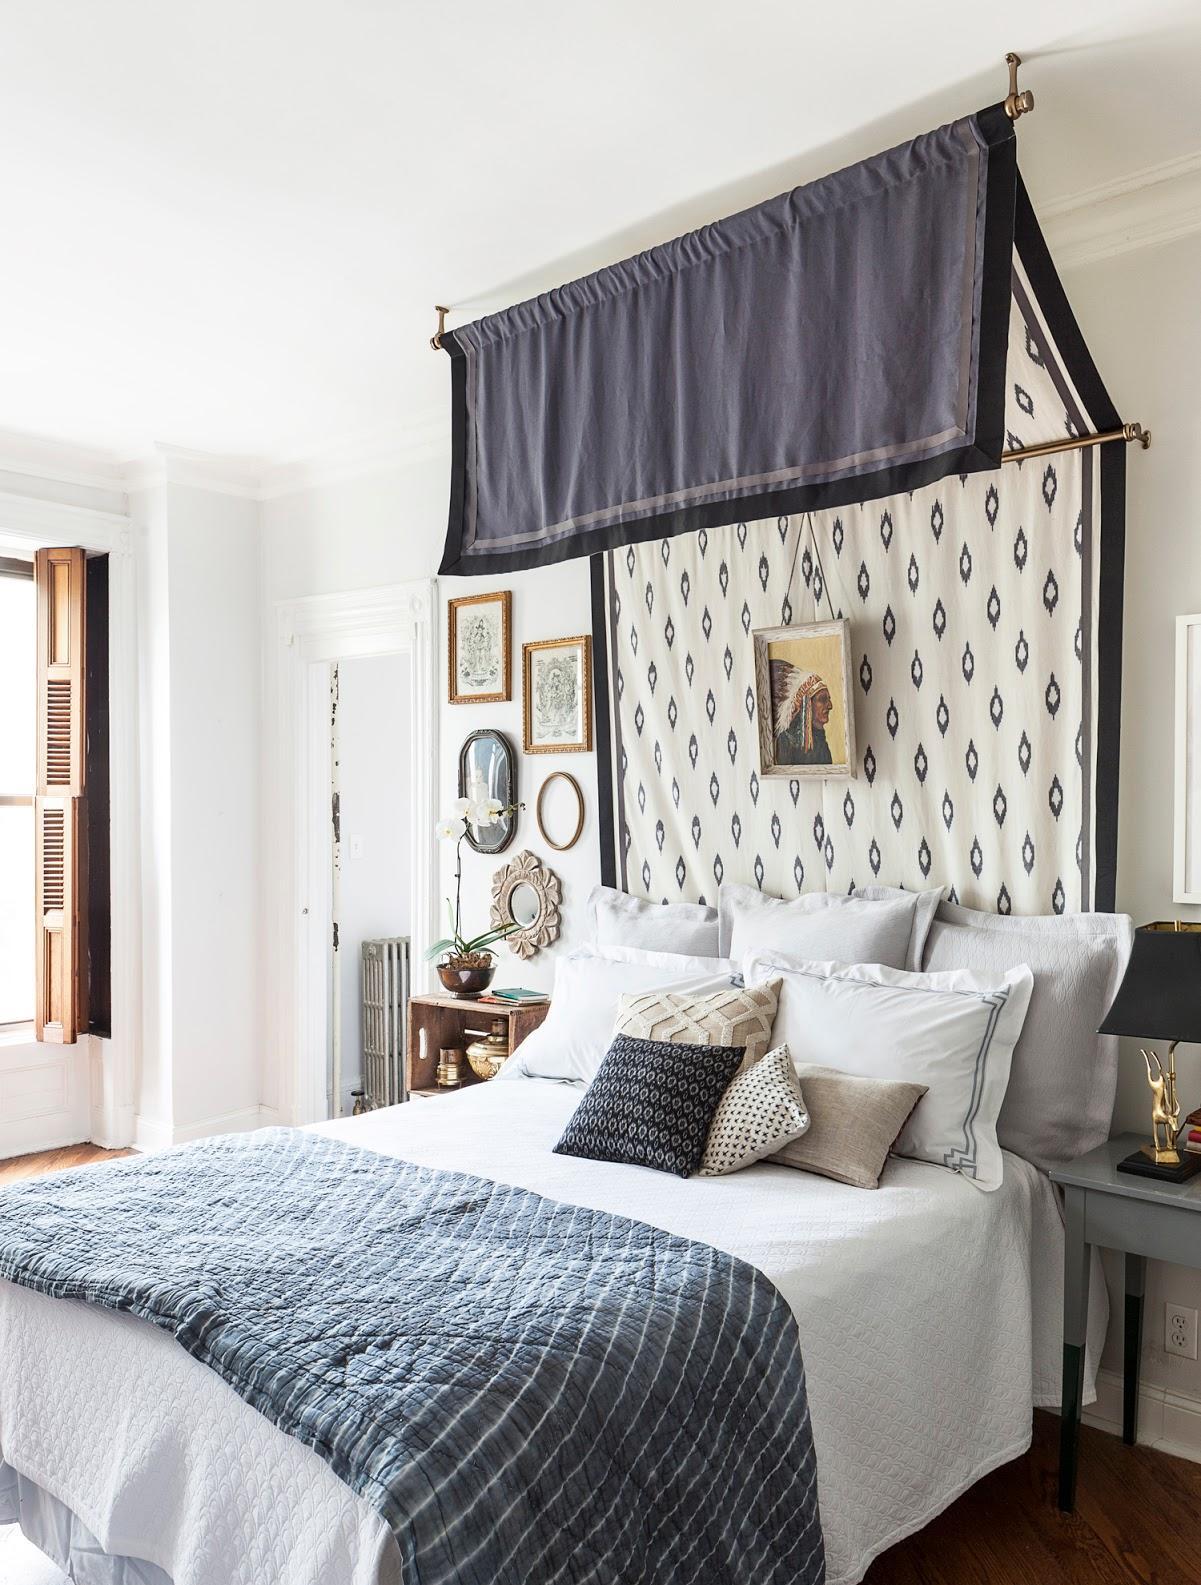 Балдахин над кроватью синий